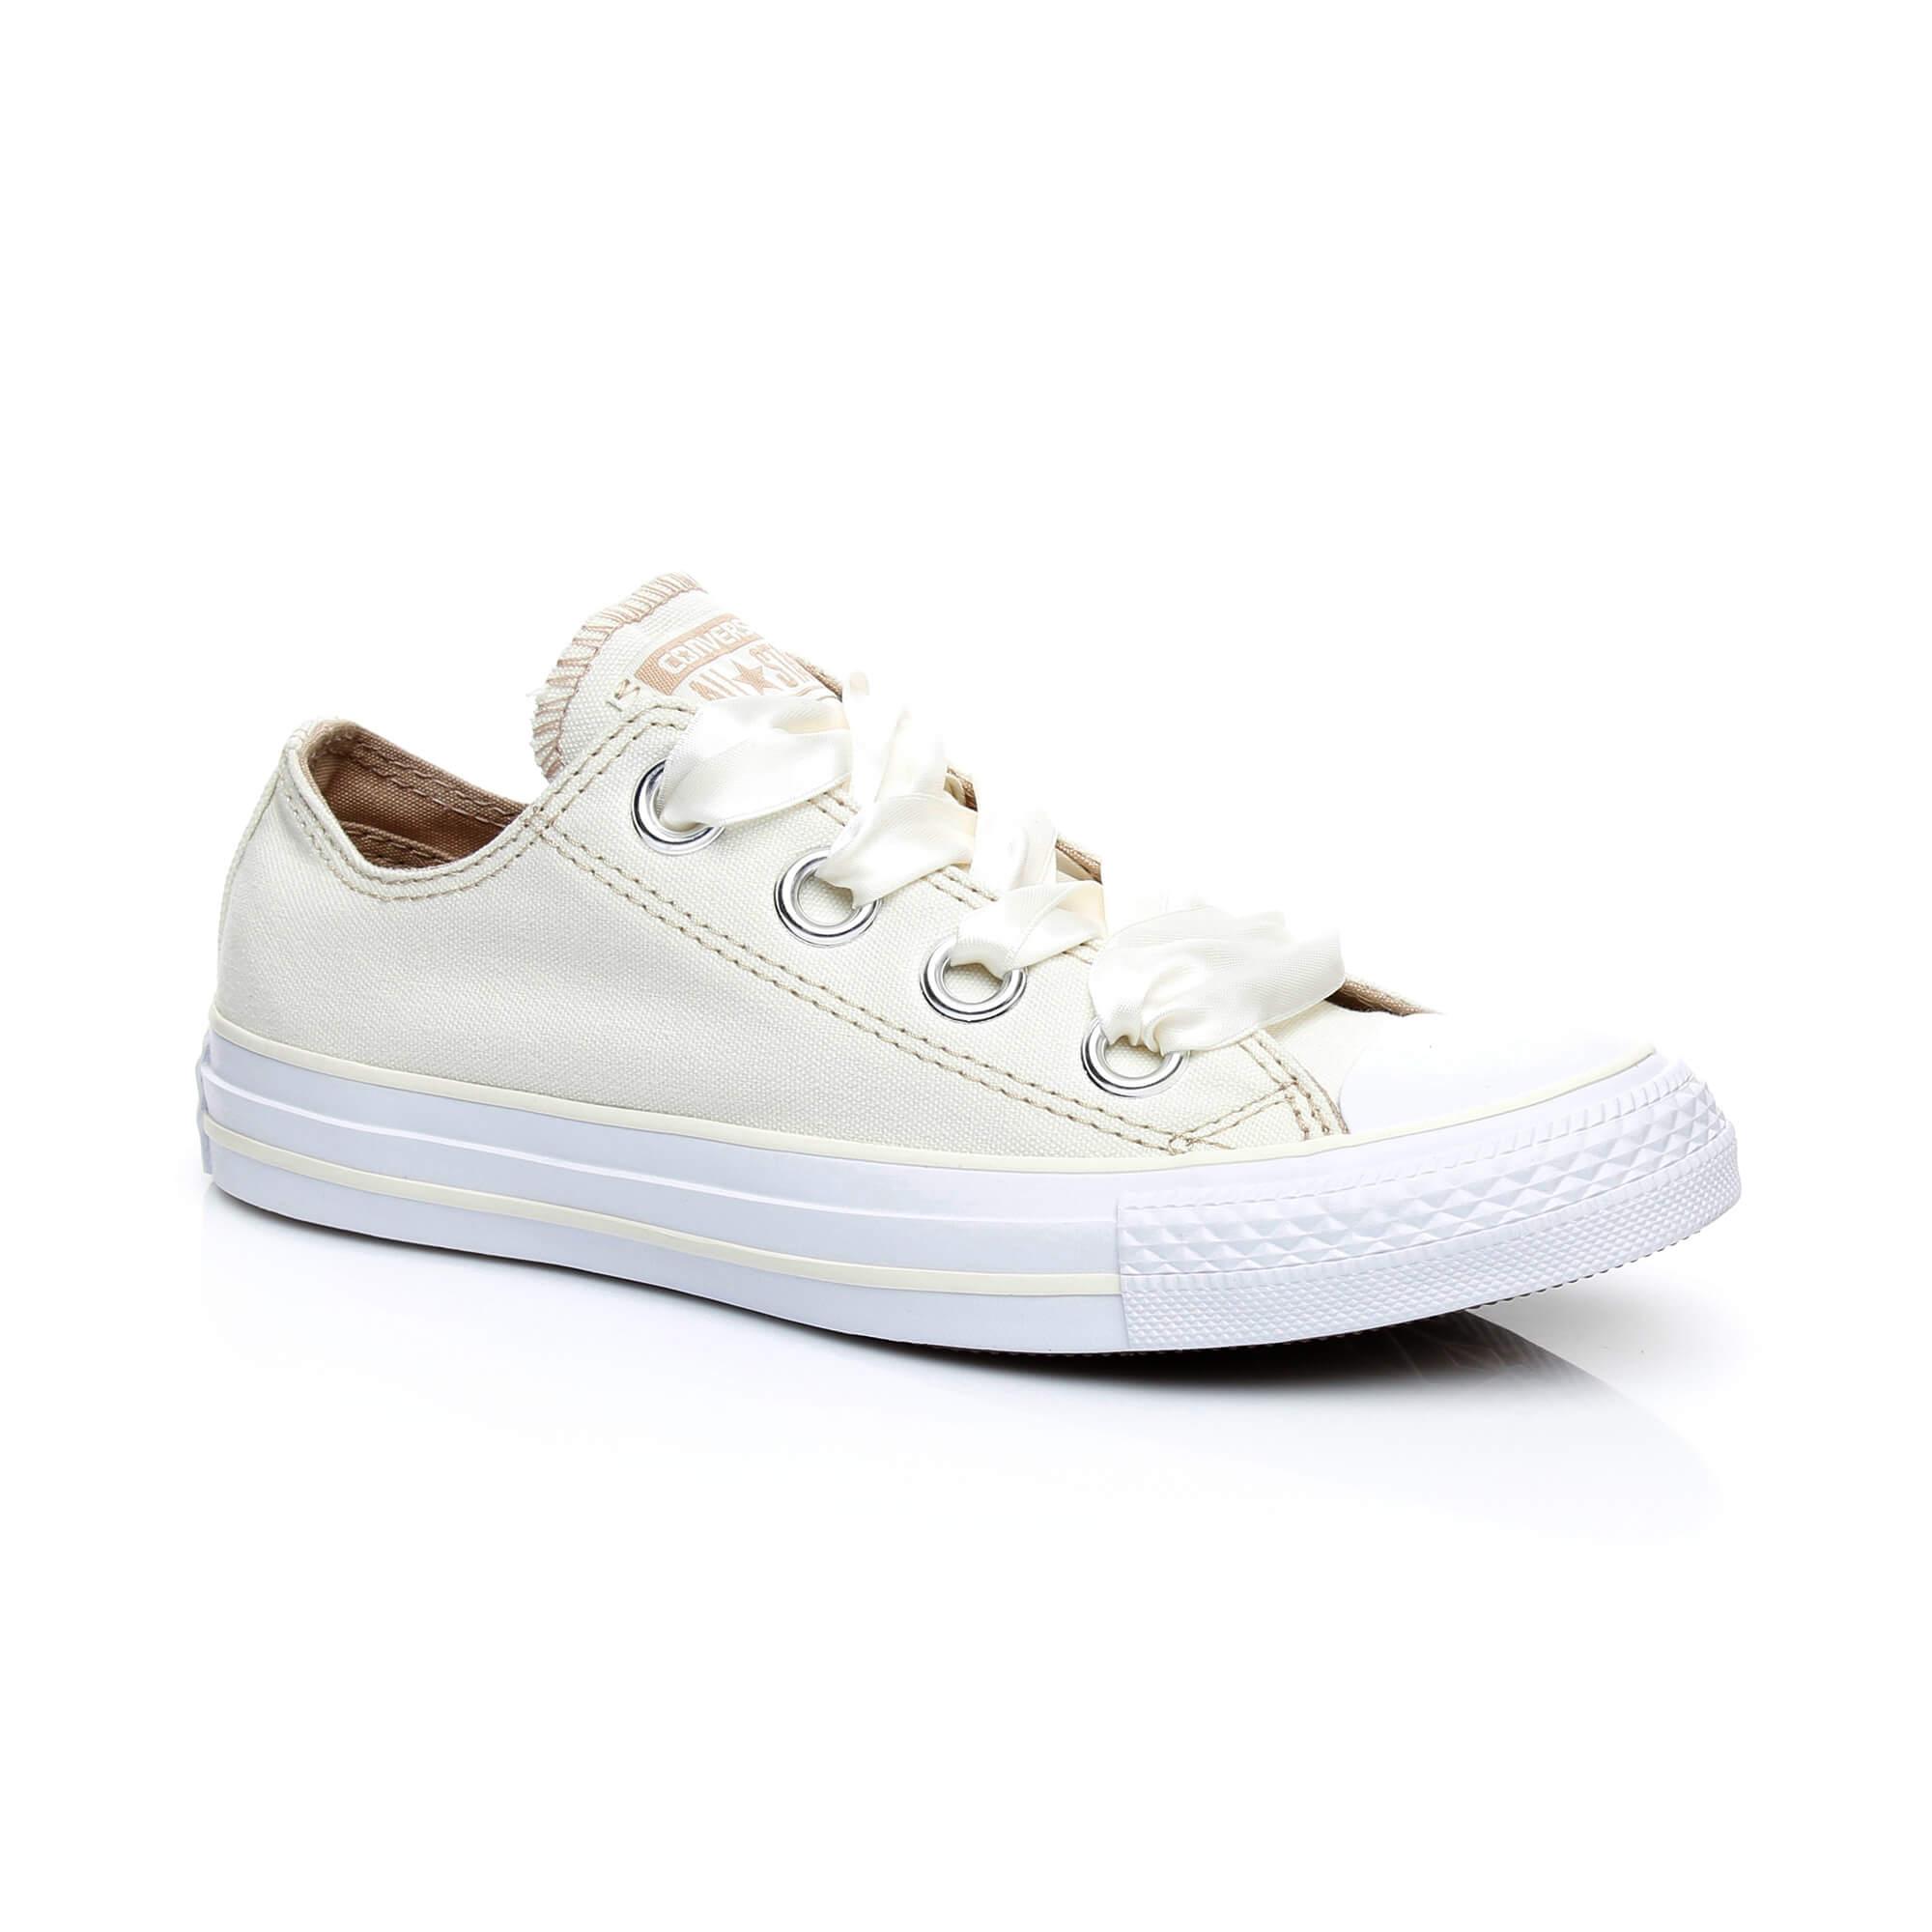 Converse Chuck Taylor Big Eyelets Kadın Bej Sneaker